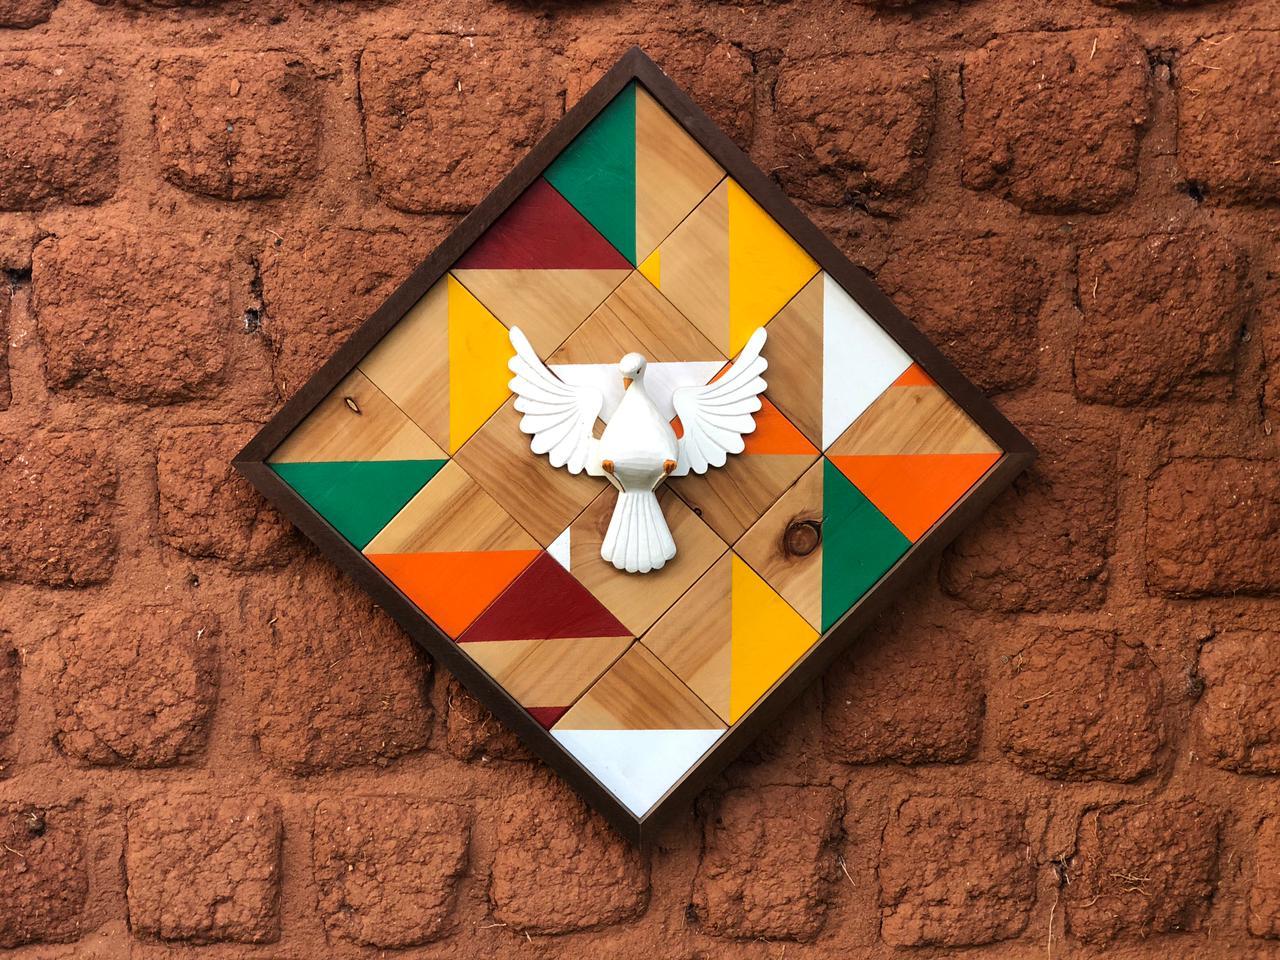 Quadro De Mosaico Divino Espirito Santo Rustico Artesanal